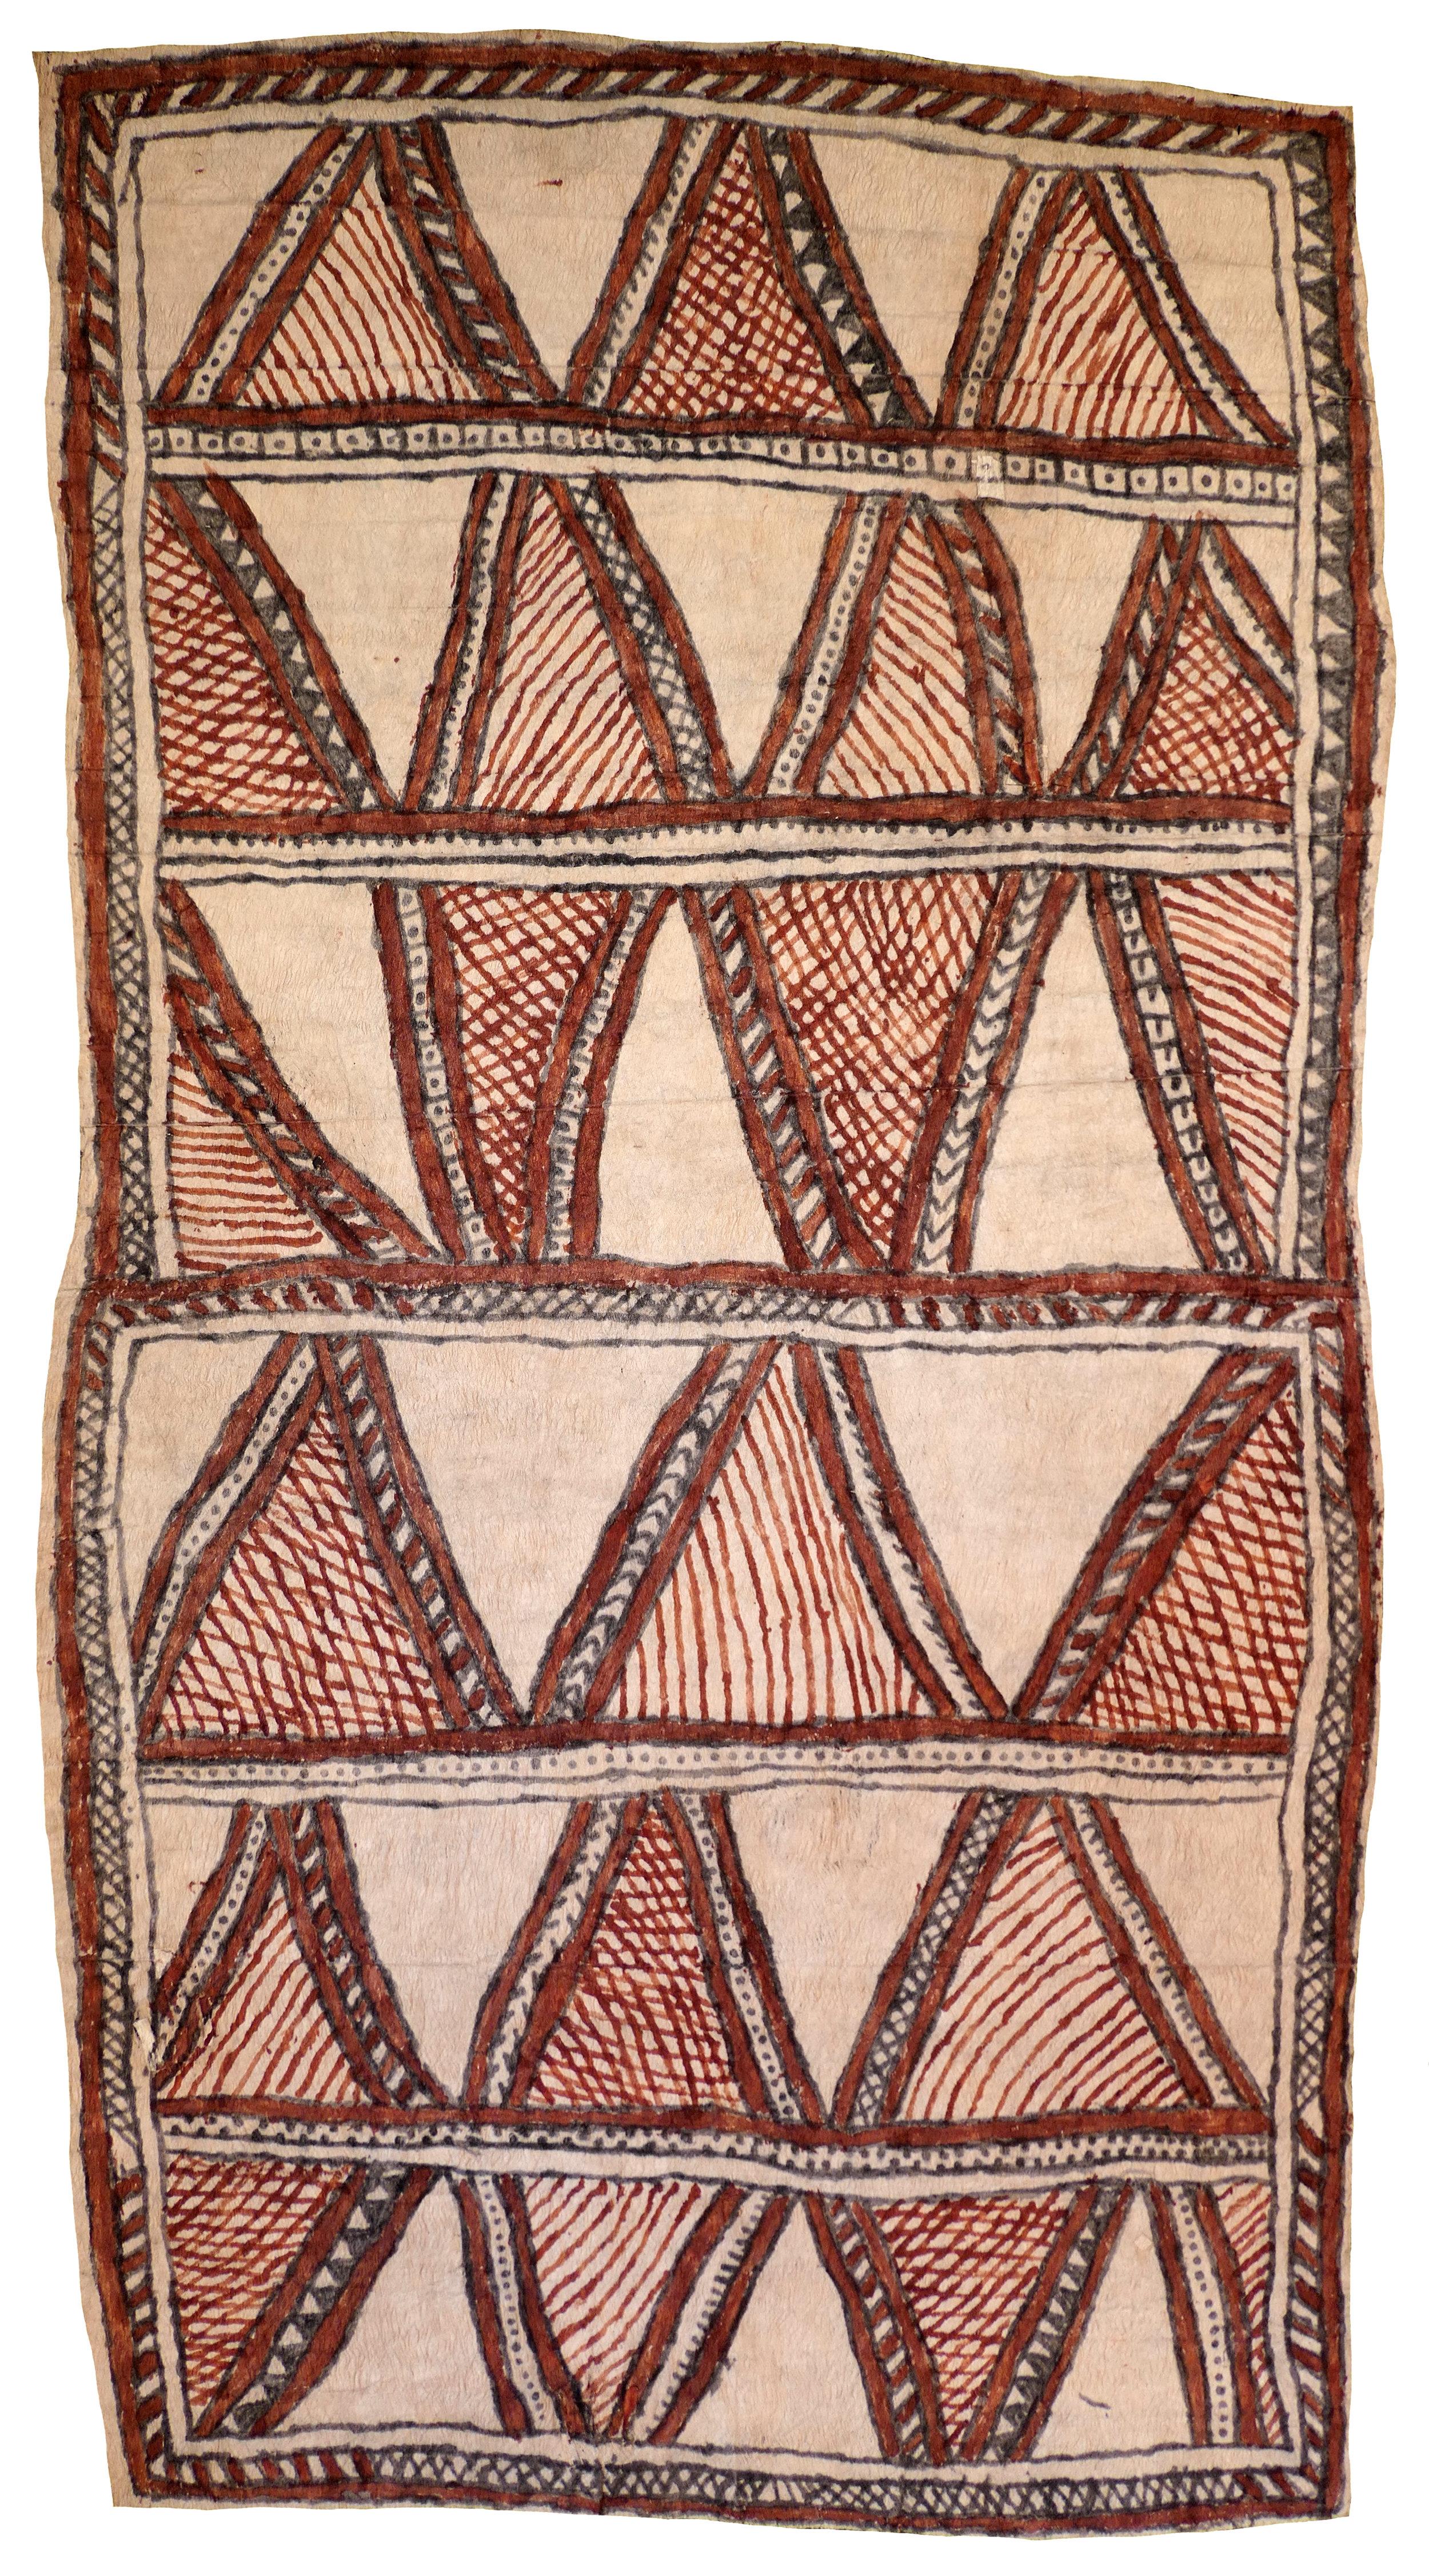 Fate Savari (Isawdi)    Amami nioge   Cloth of the Ancestors  114 x 62cm  Natural pigments on nioge (barkcloth), 2017